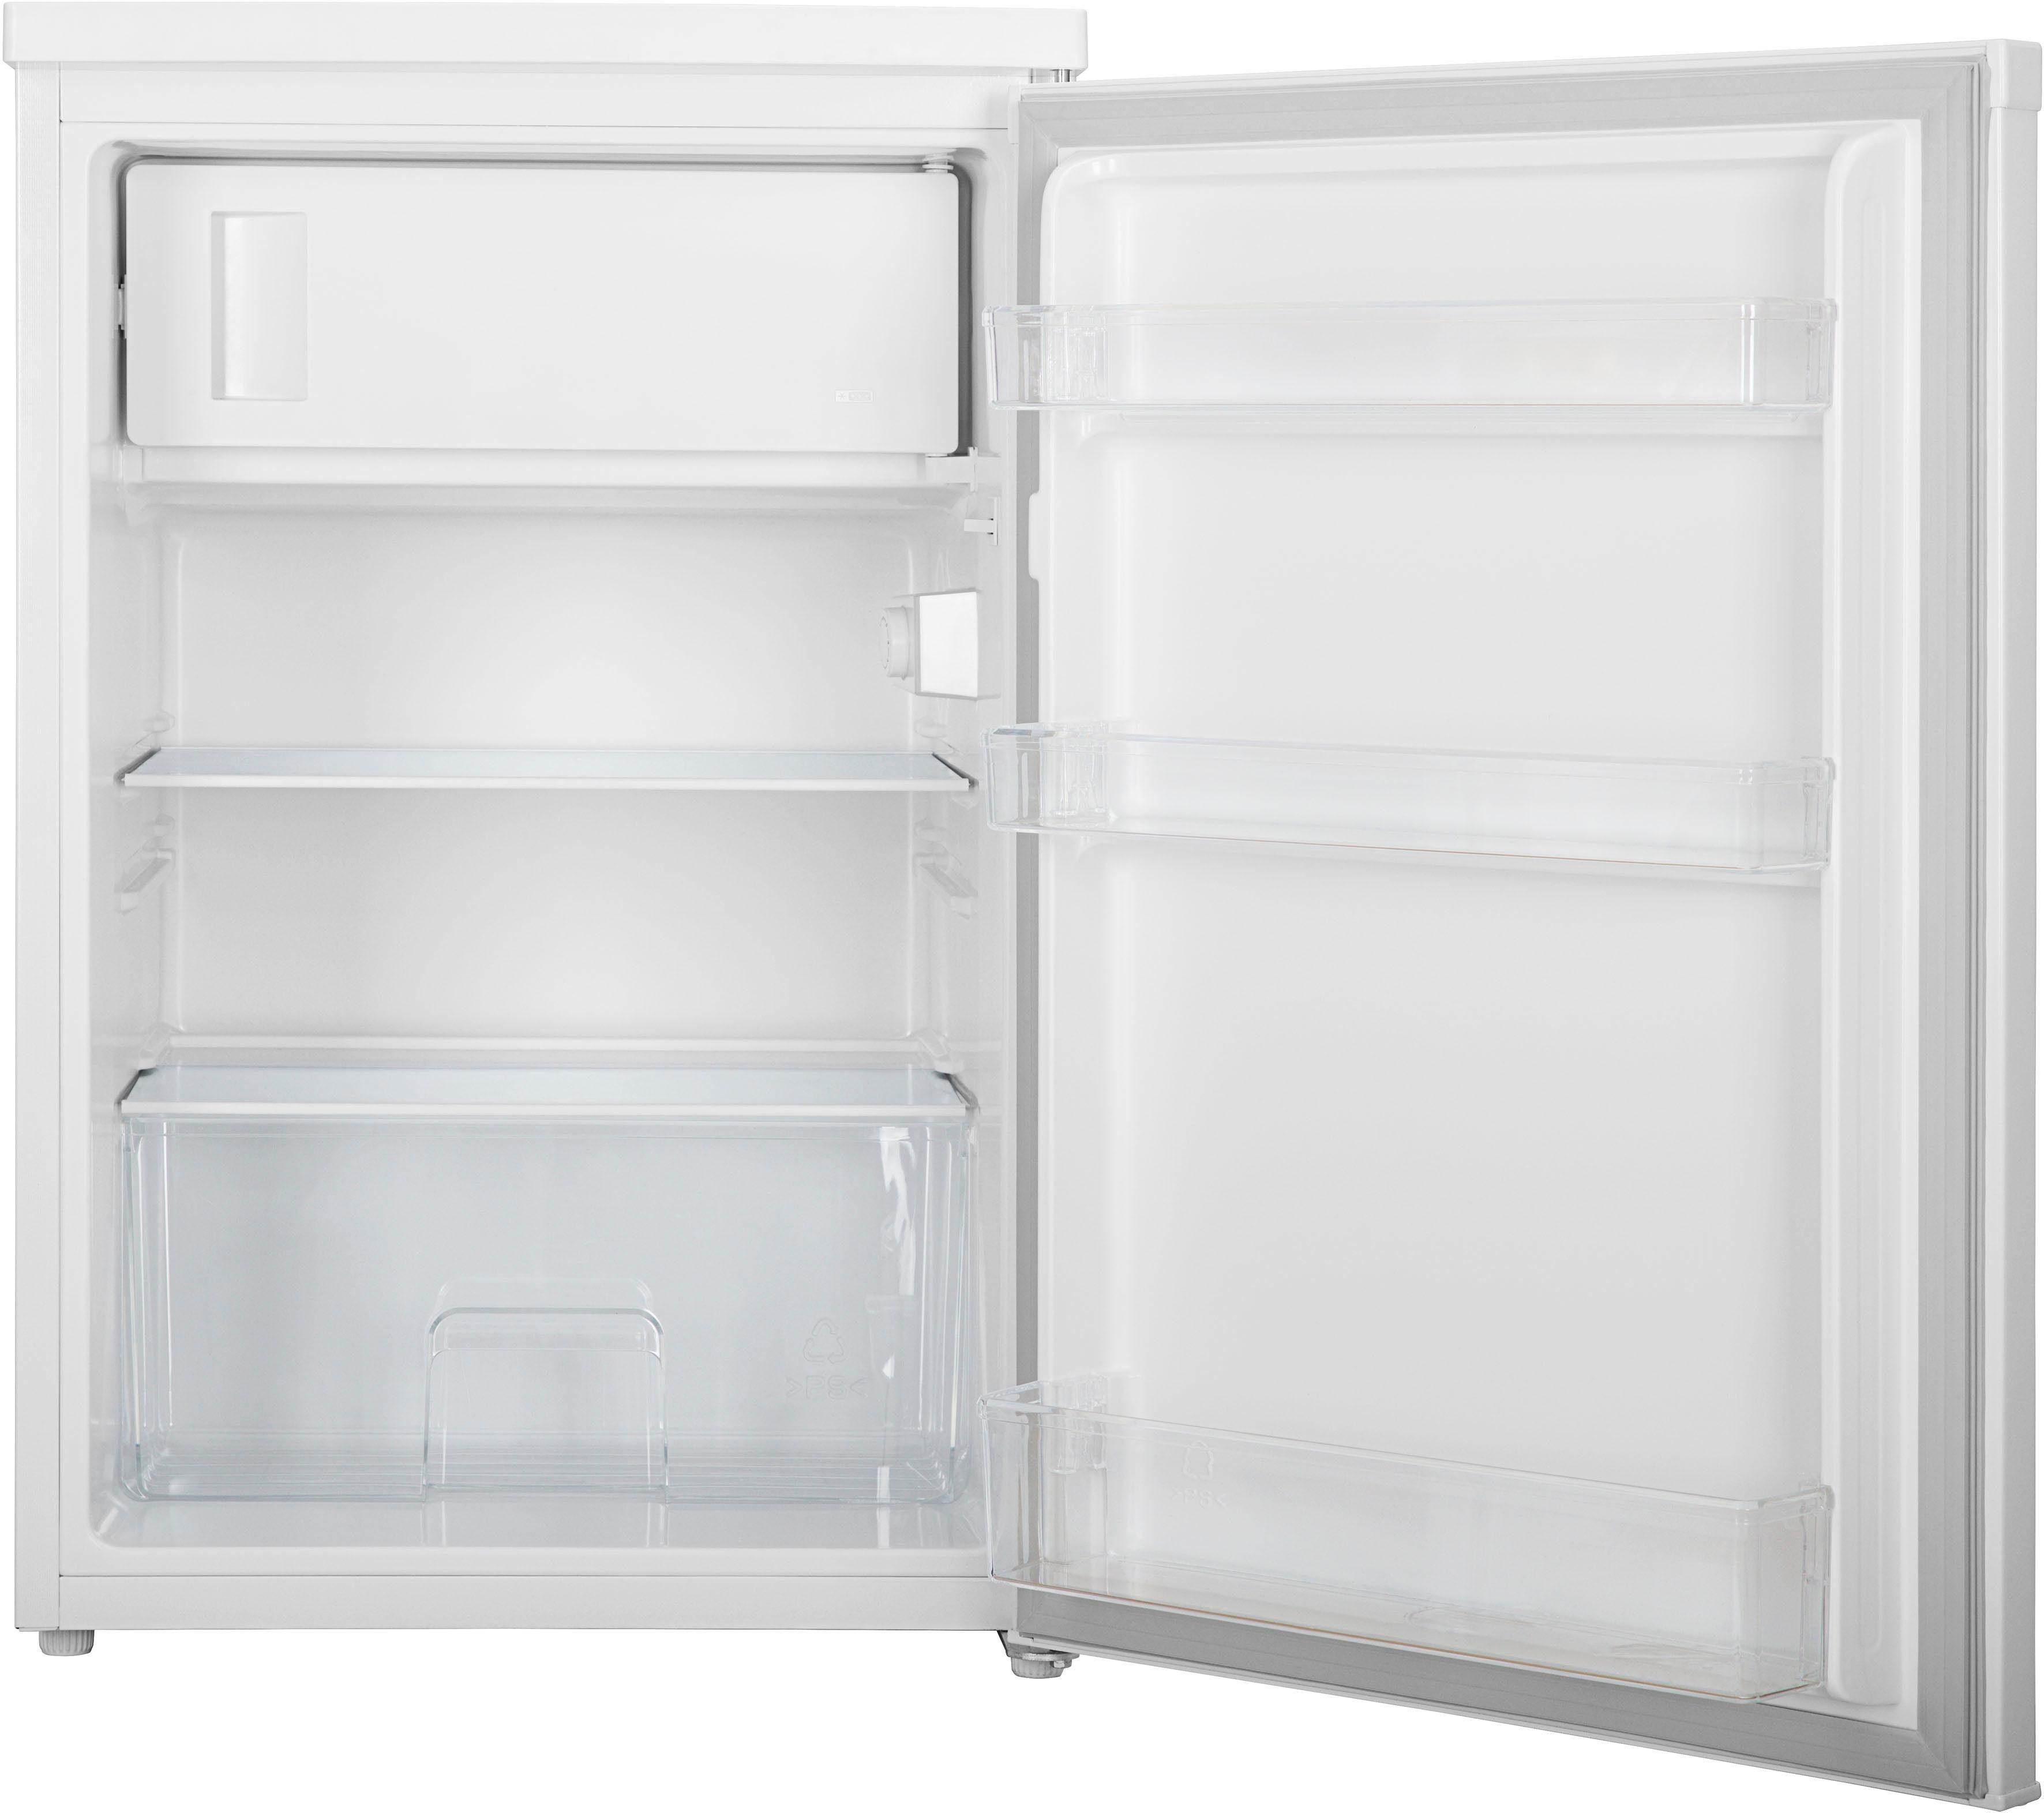 PKM Kühlschrank KS115.4A++T3, 84,5 cm hoch, 56 cm breit